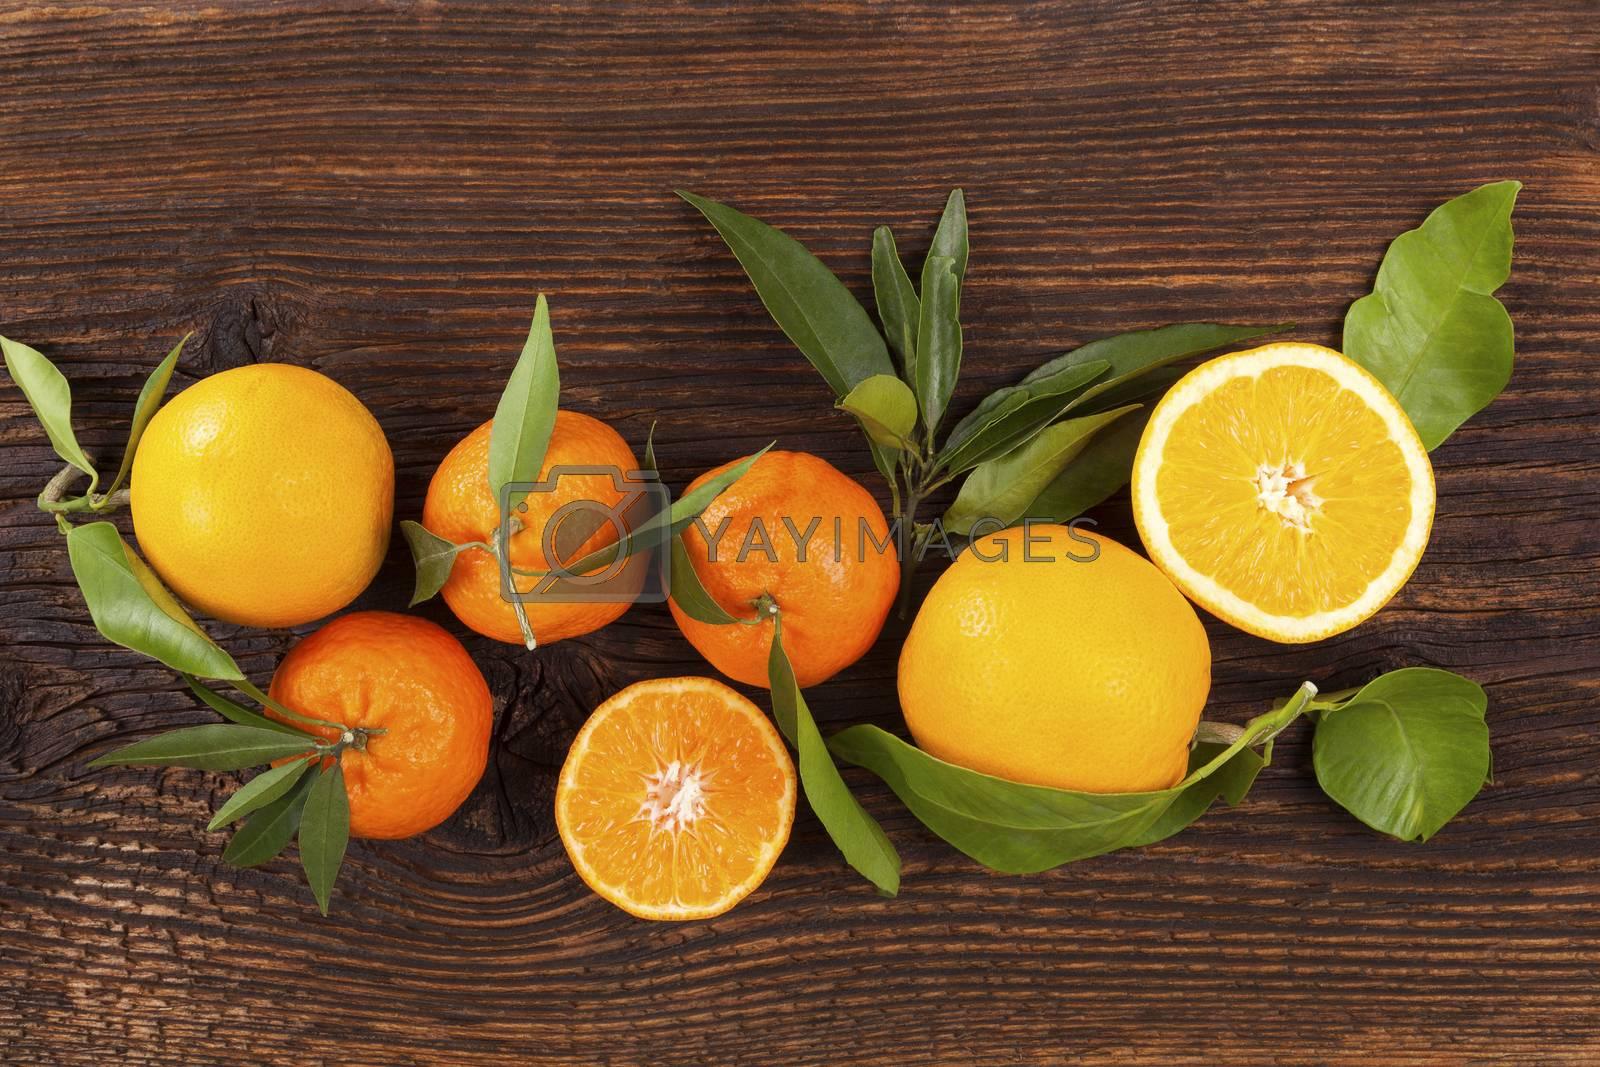 Fresh ripe mandarines with green leaves on wooden table. Organic fresh mandarines, healthy fruit eating.